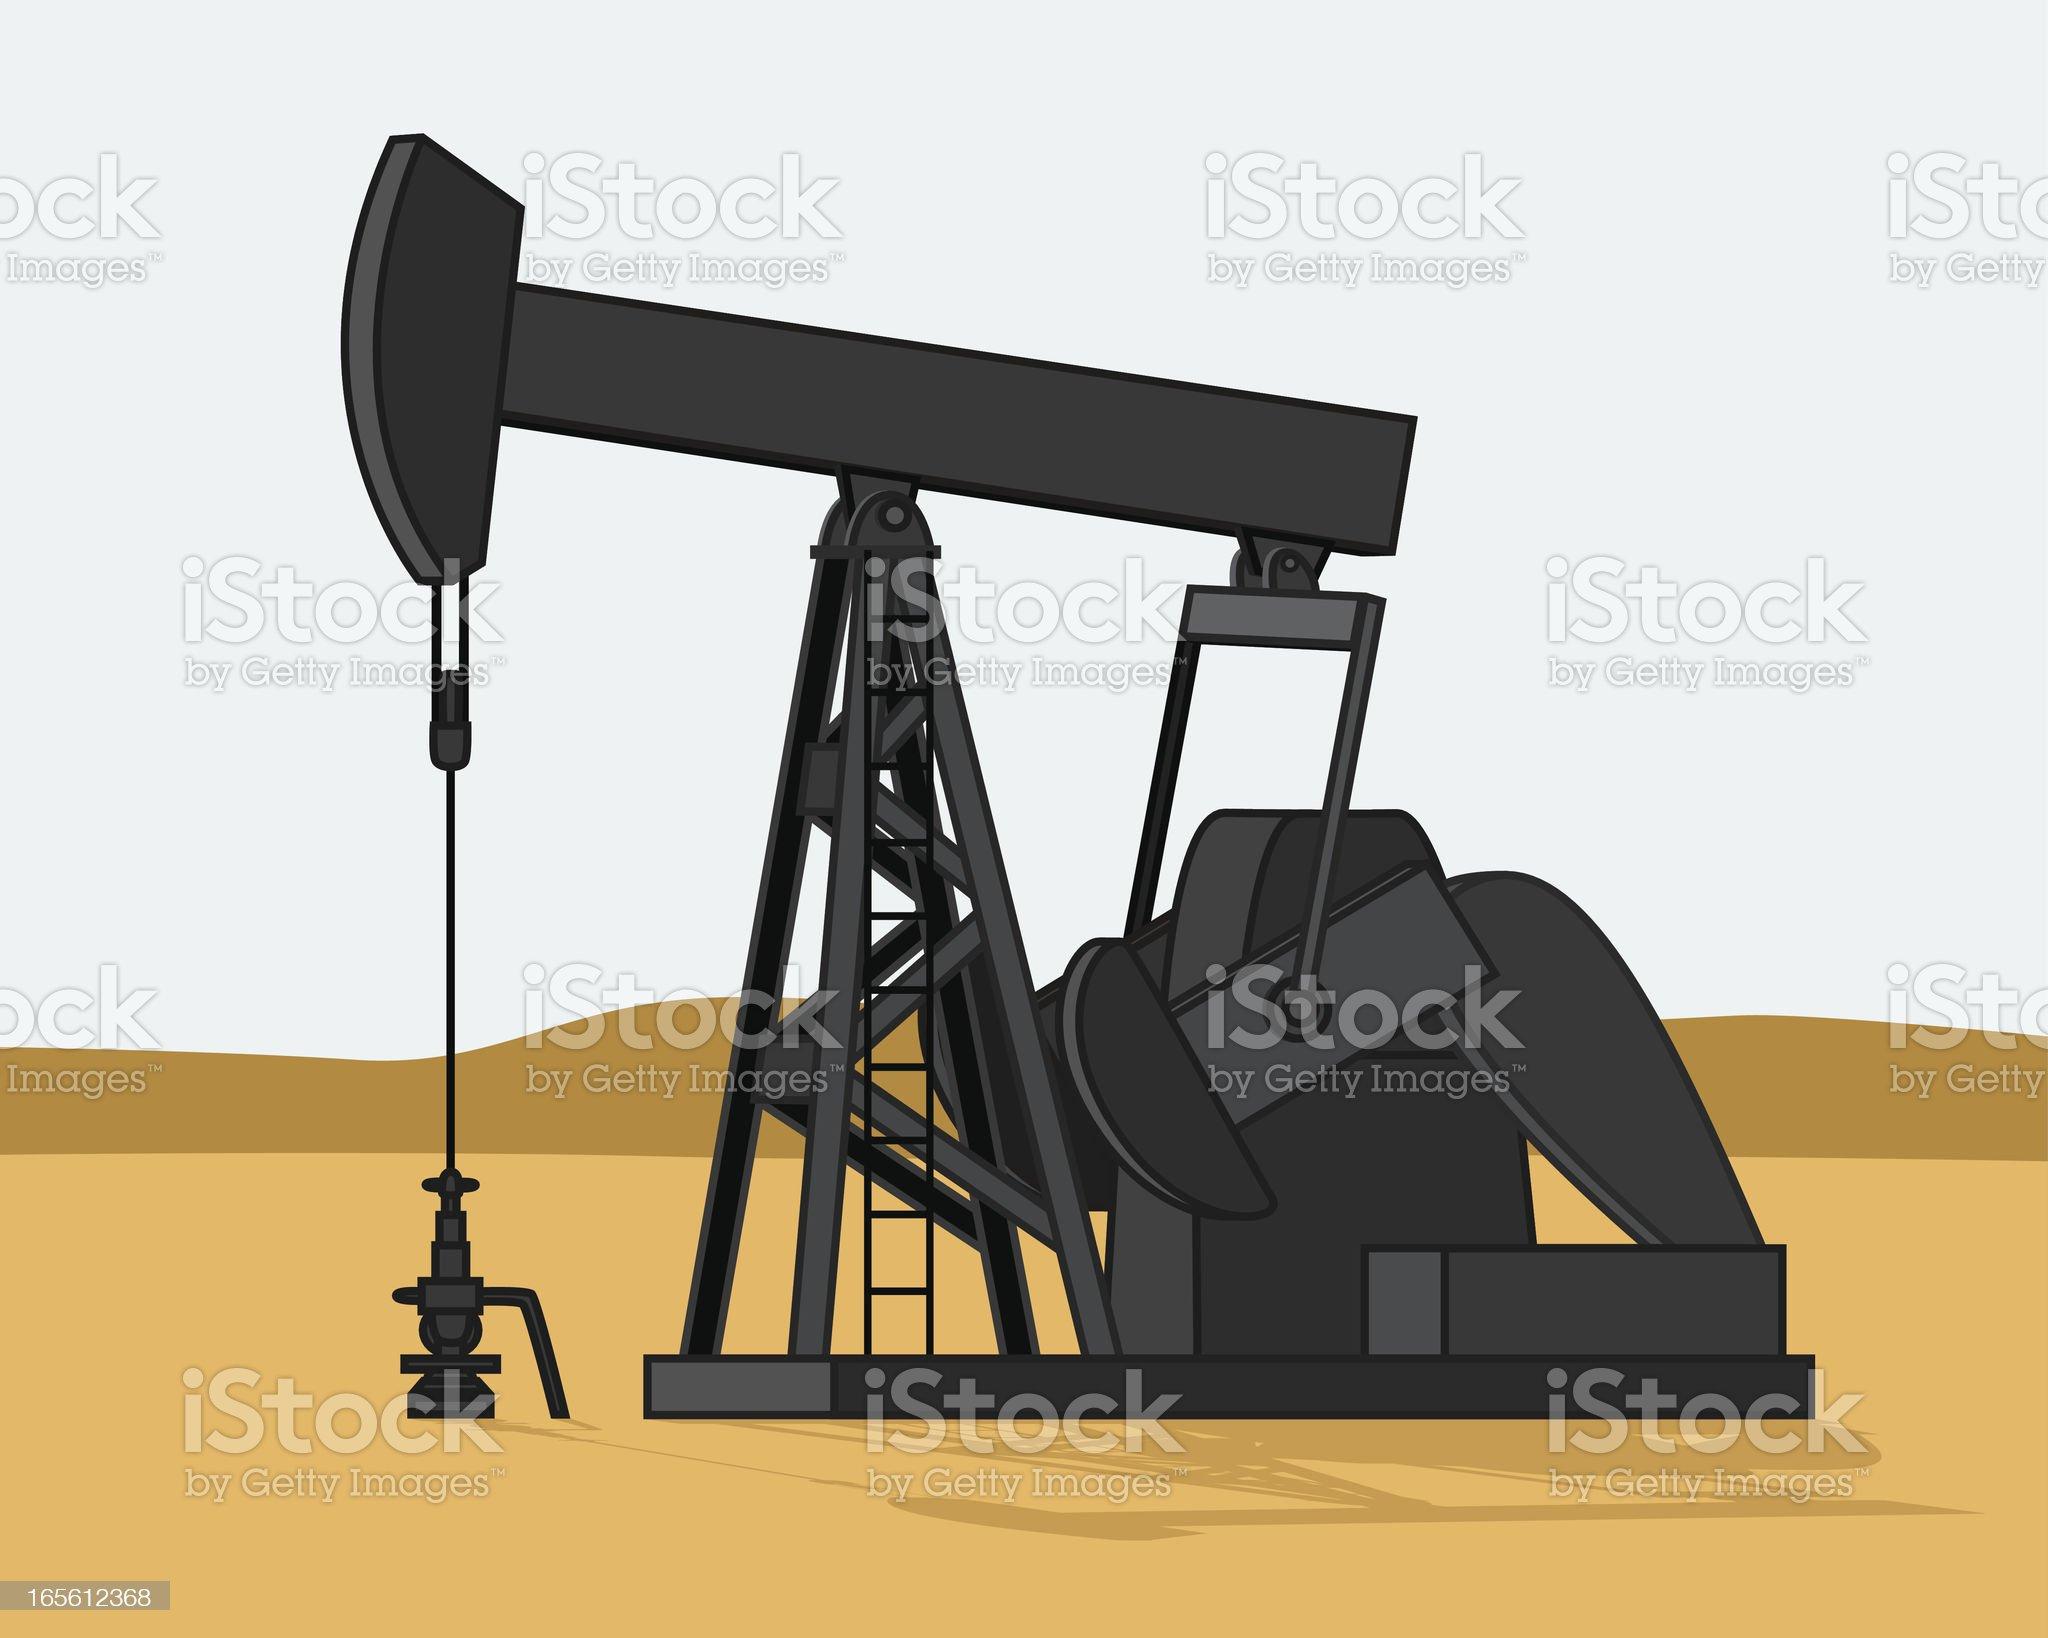 Oil Well Pumpjack royalty-free stock vector art